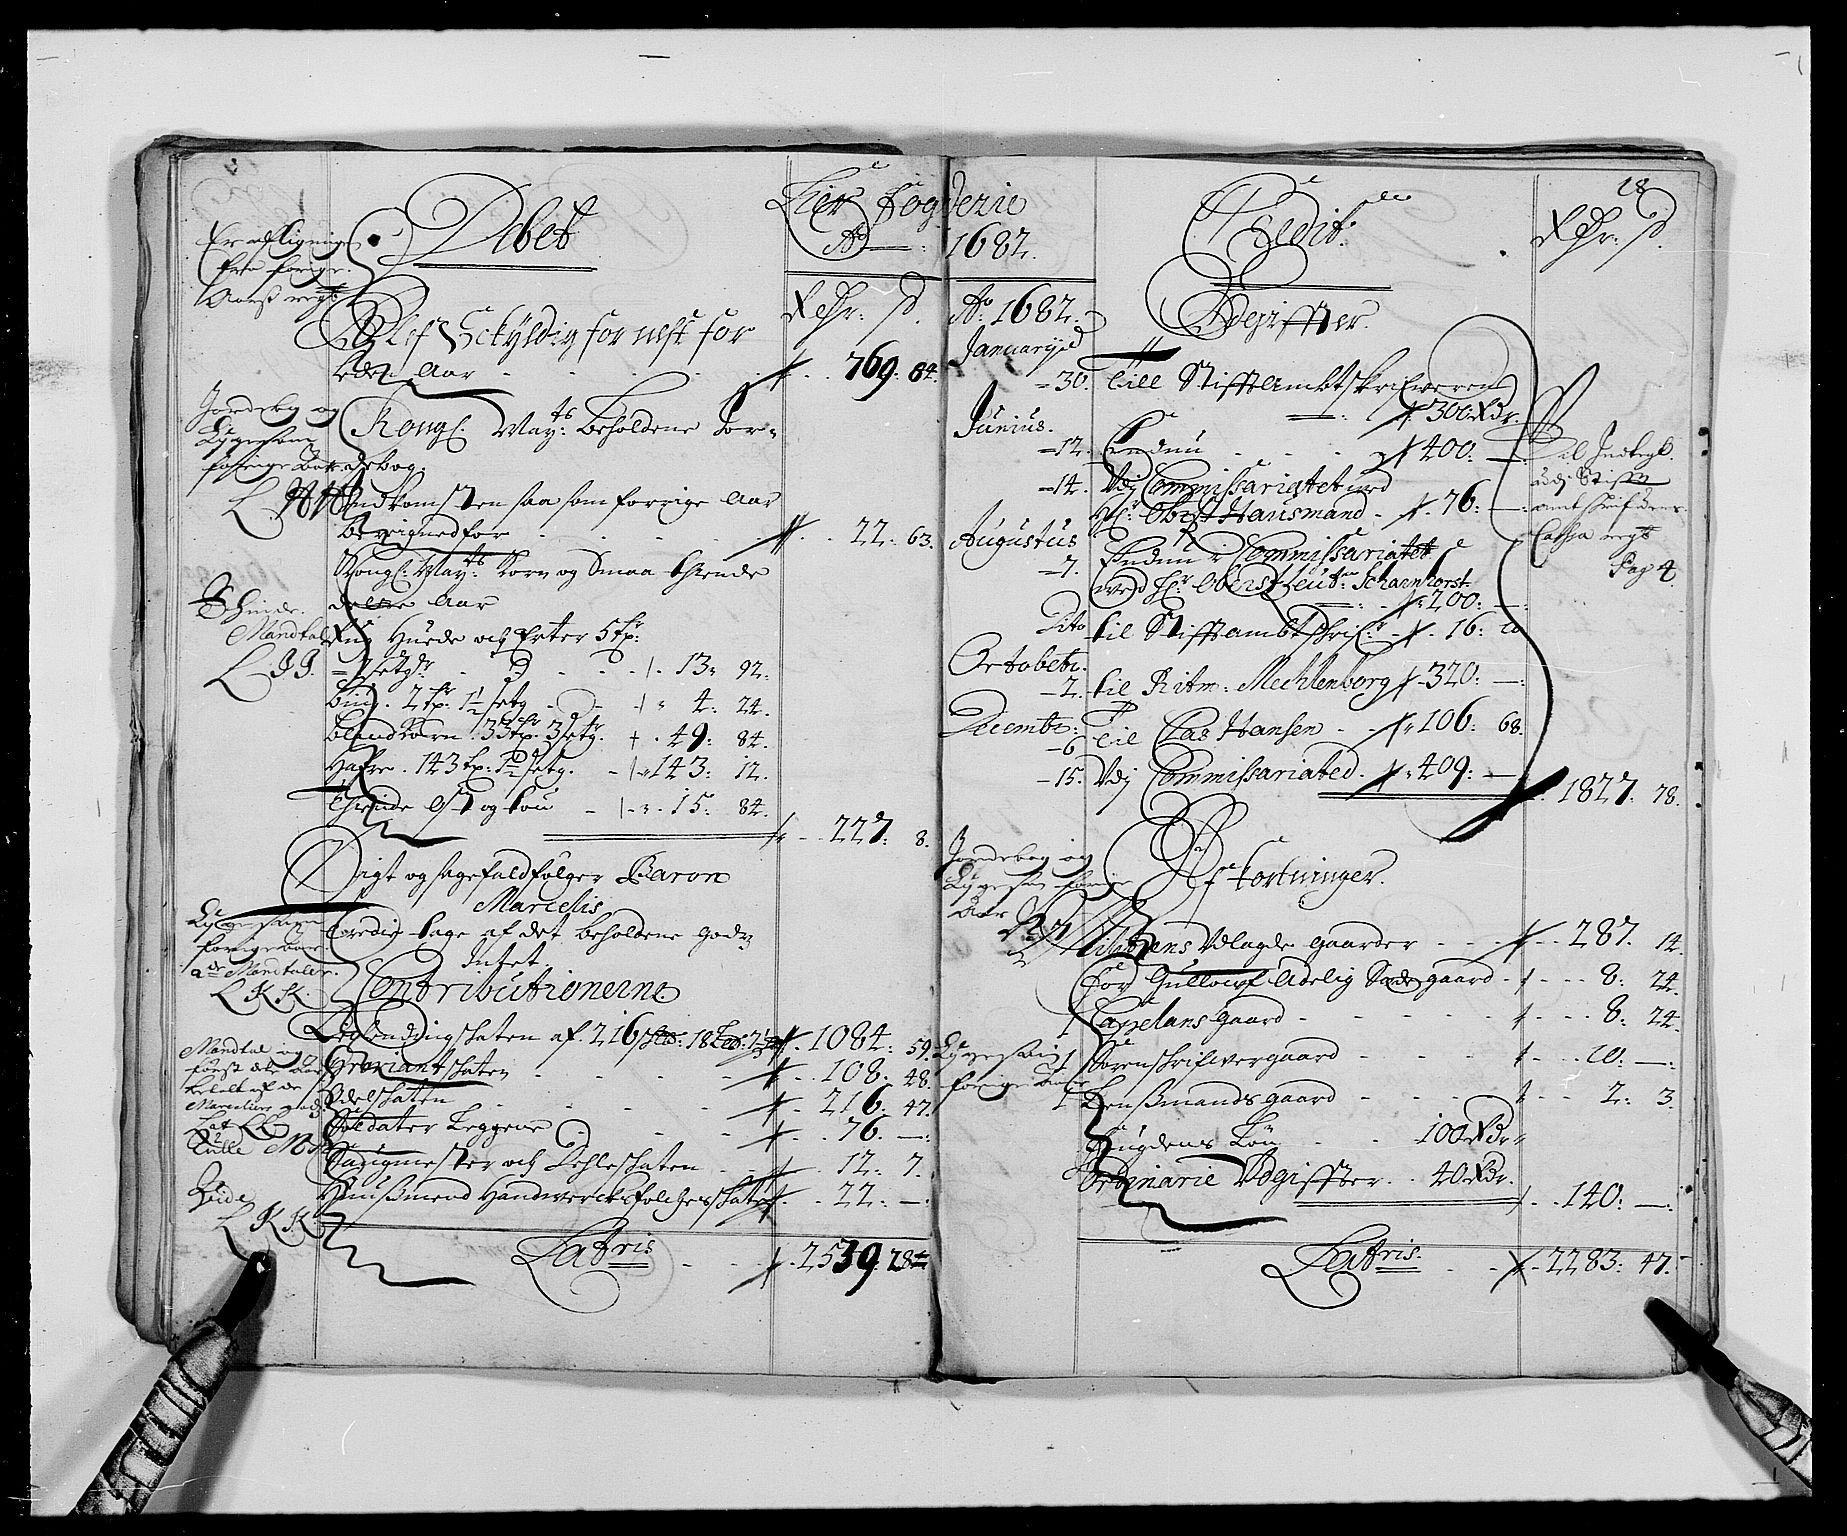 RA, Rentekammeret inntil 1814, Reviderte regnskaper, Fogderegnskap, R27/L1686: Fogderegnskap Lier, 1678-1686, s. 21